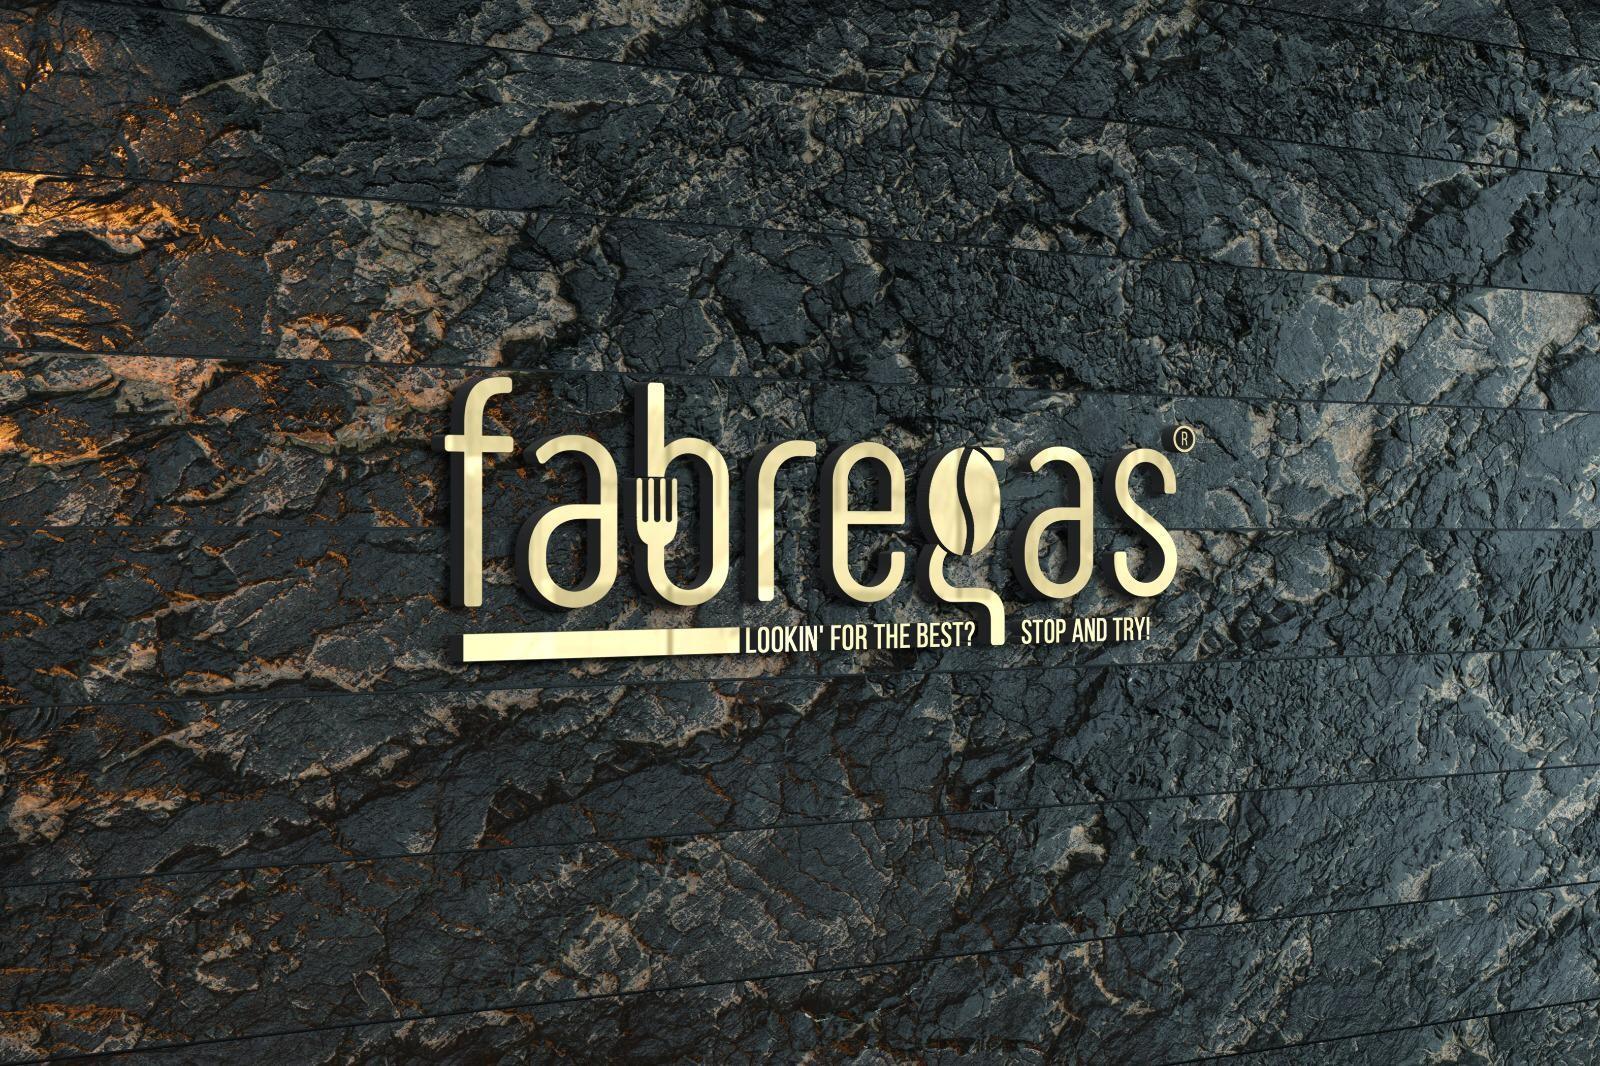 https://www.fabregascafe.com